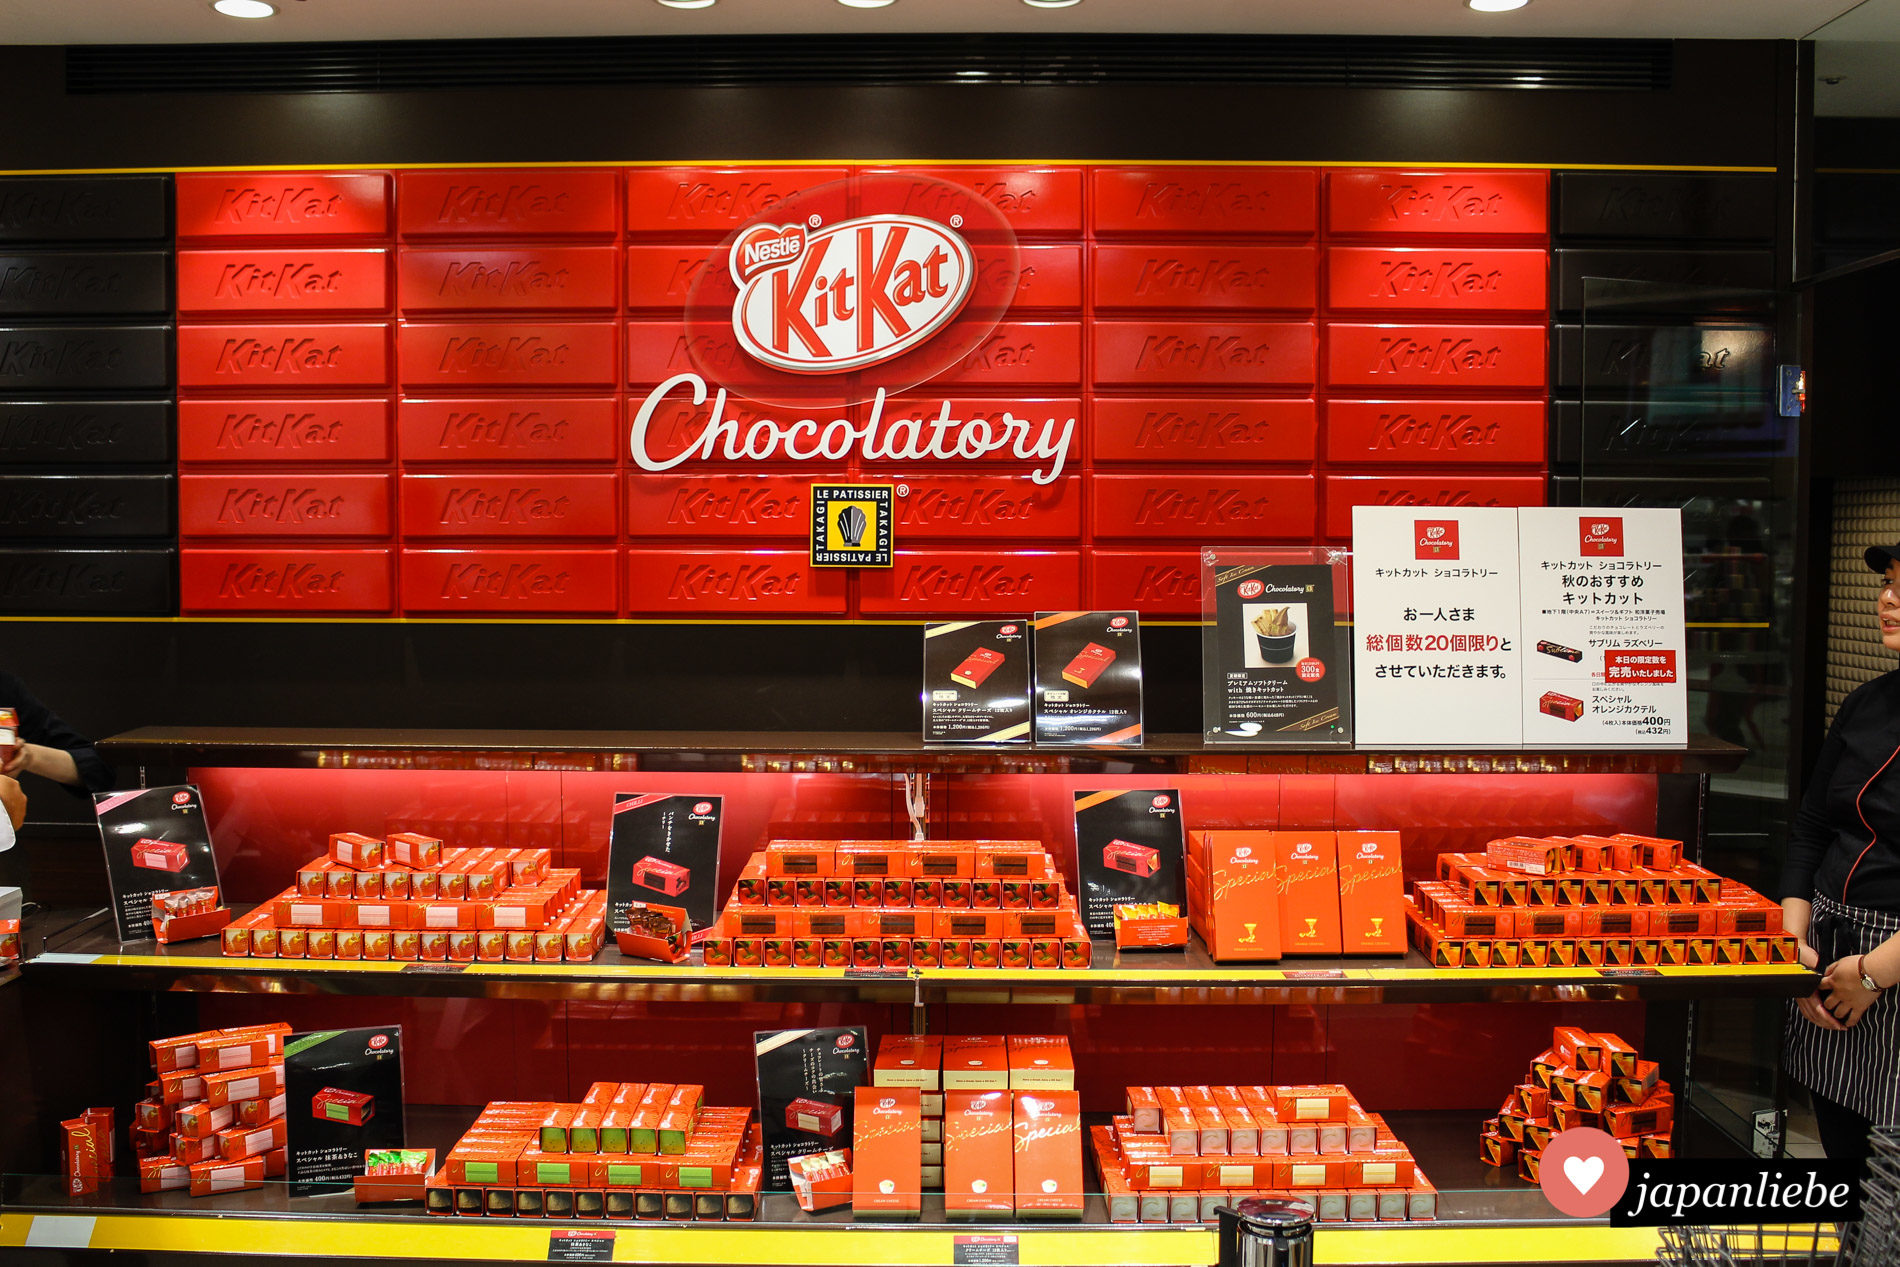 Die KitKat Chocolatery in Tōkyō.